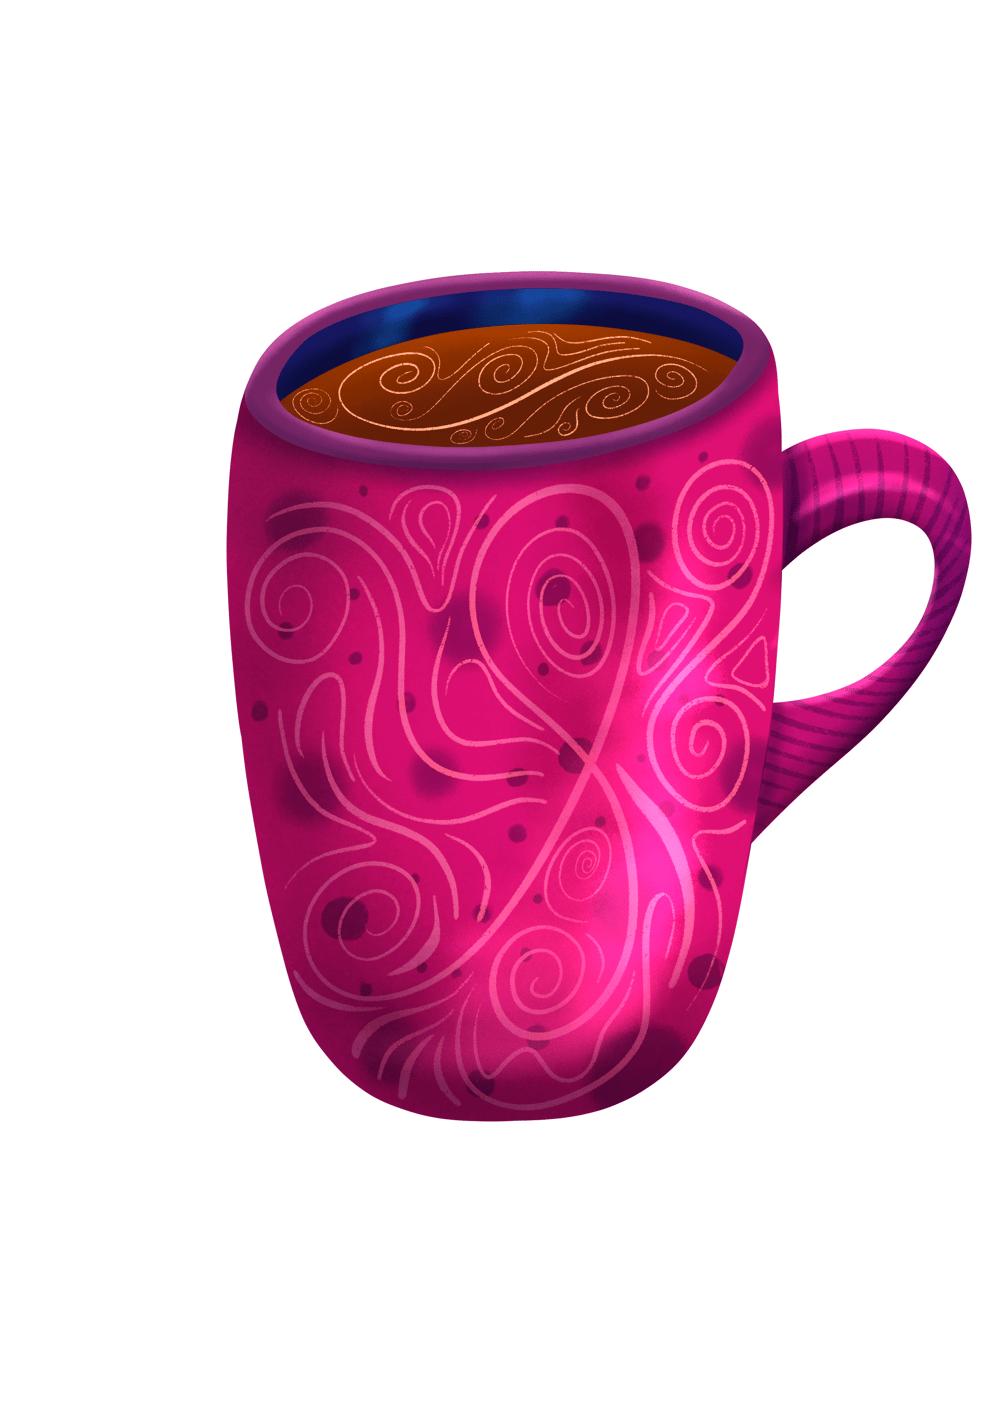 My Mug - image 1 - student project